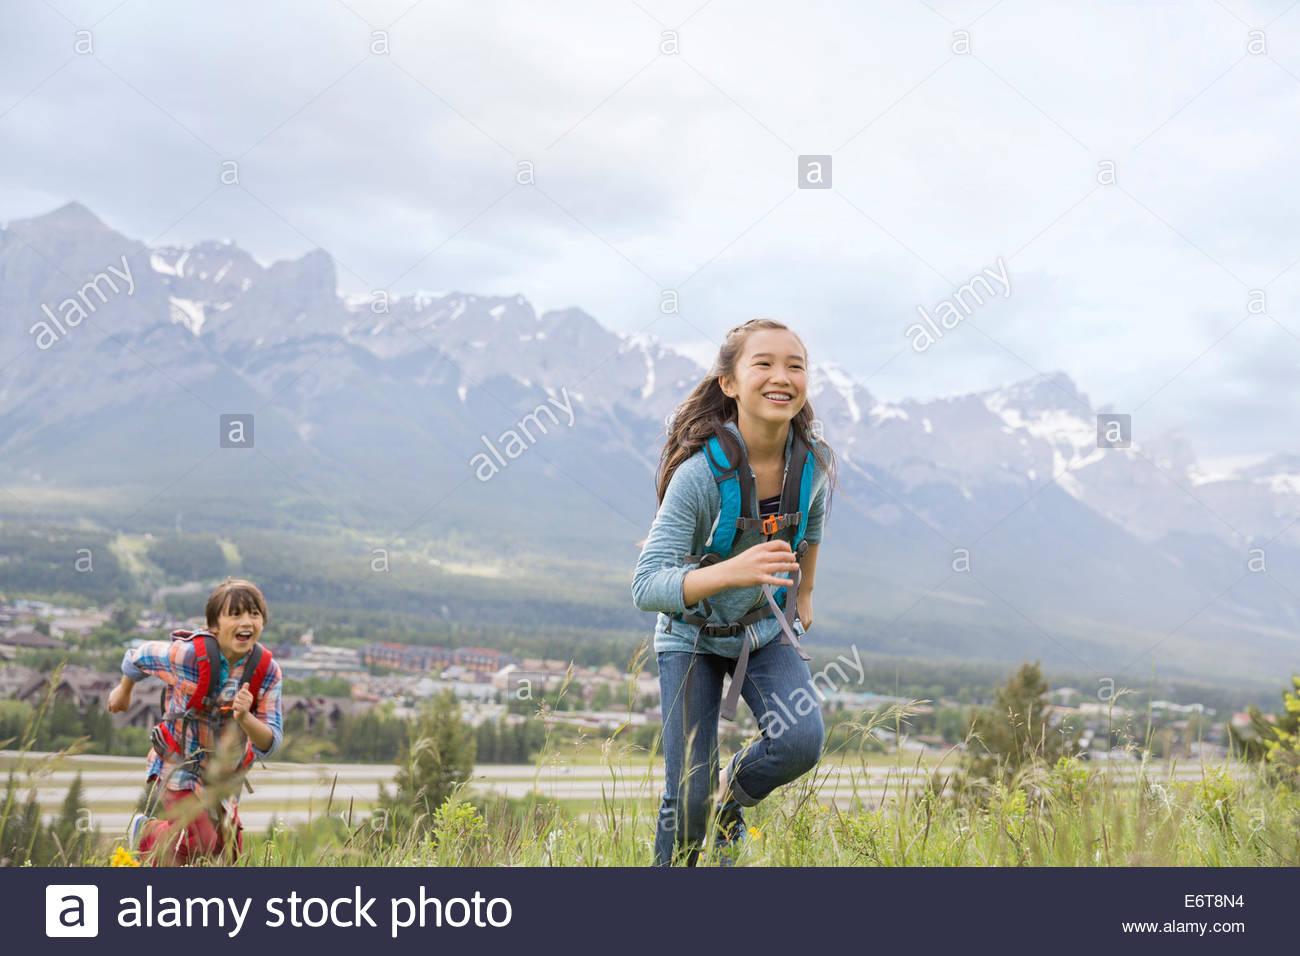 Les enfants randonnées on rural hillside Photo Stock